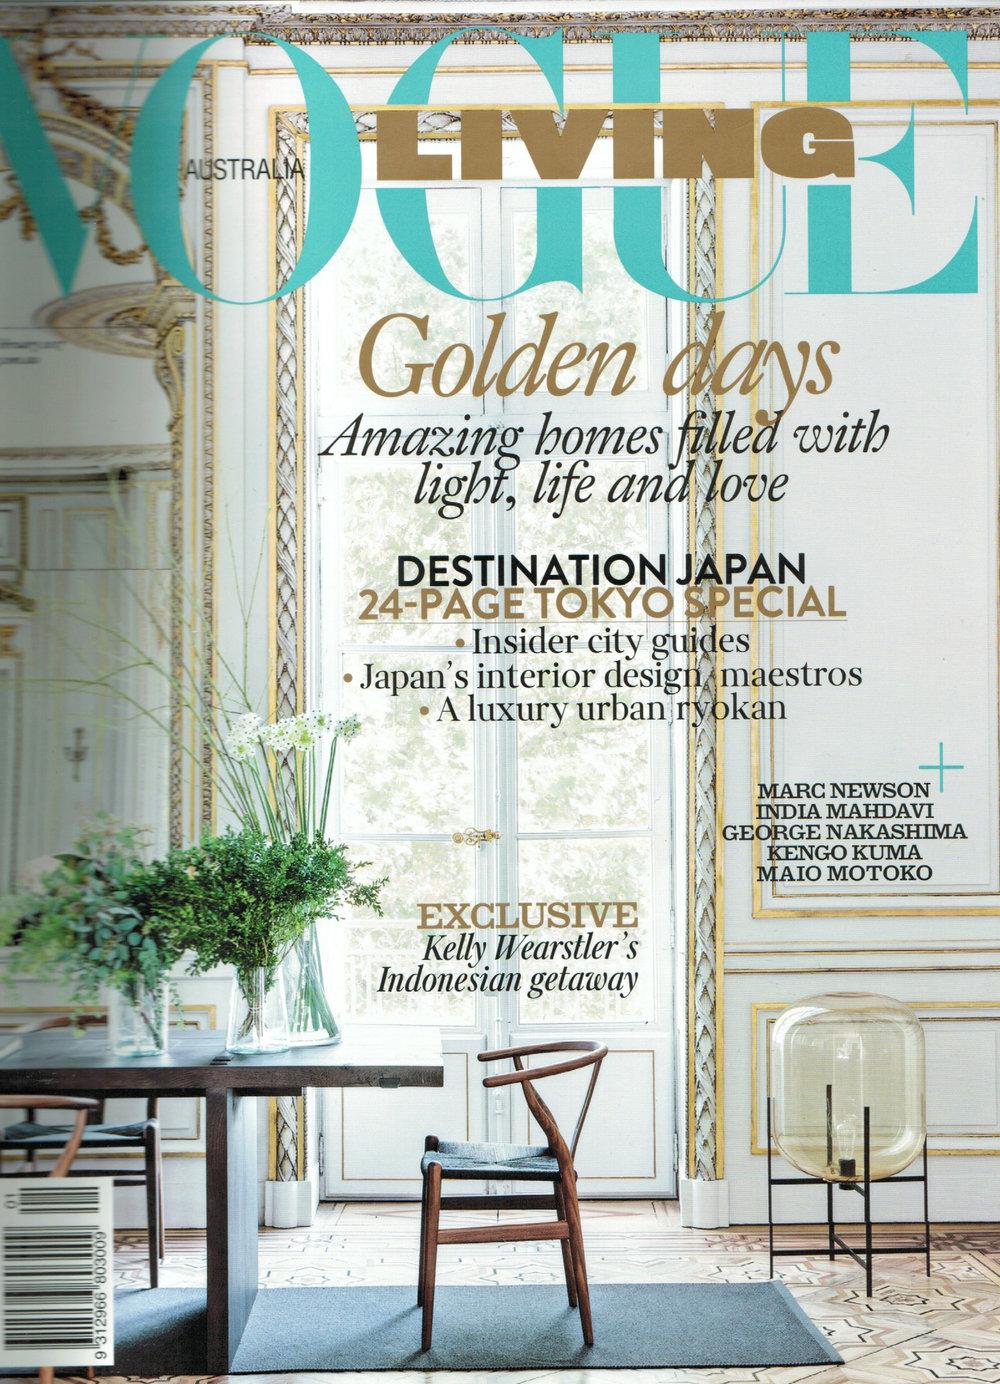 Vogue LM Dec.jpg